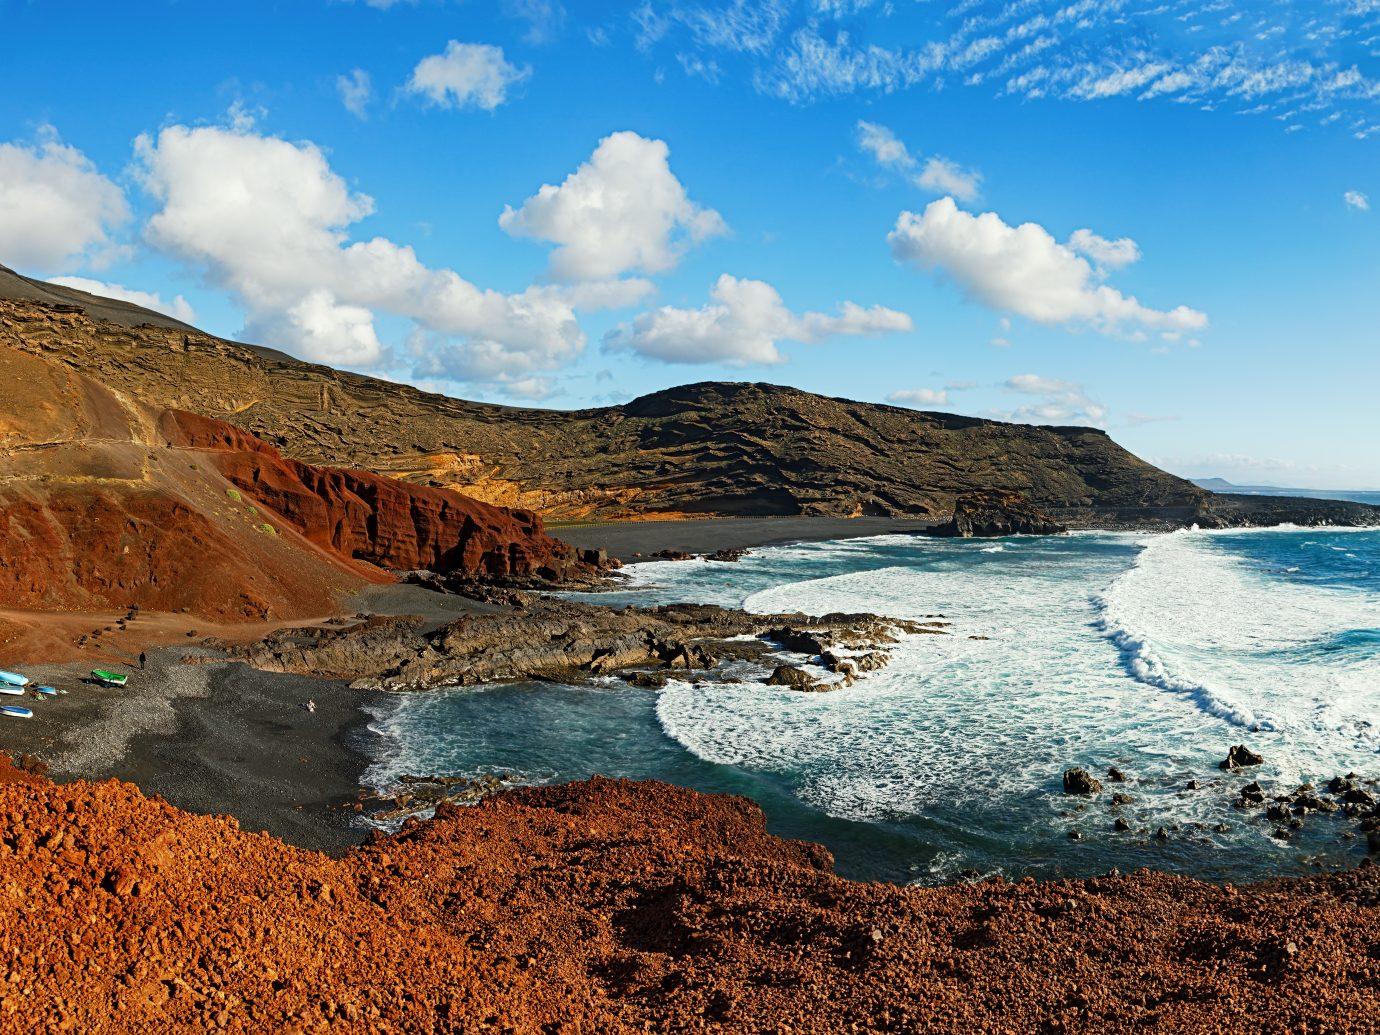 Panoramic view of El Golfo black sand beach near Green Lagoon in Lanzarote, Canary Islands.